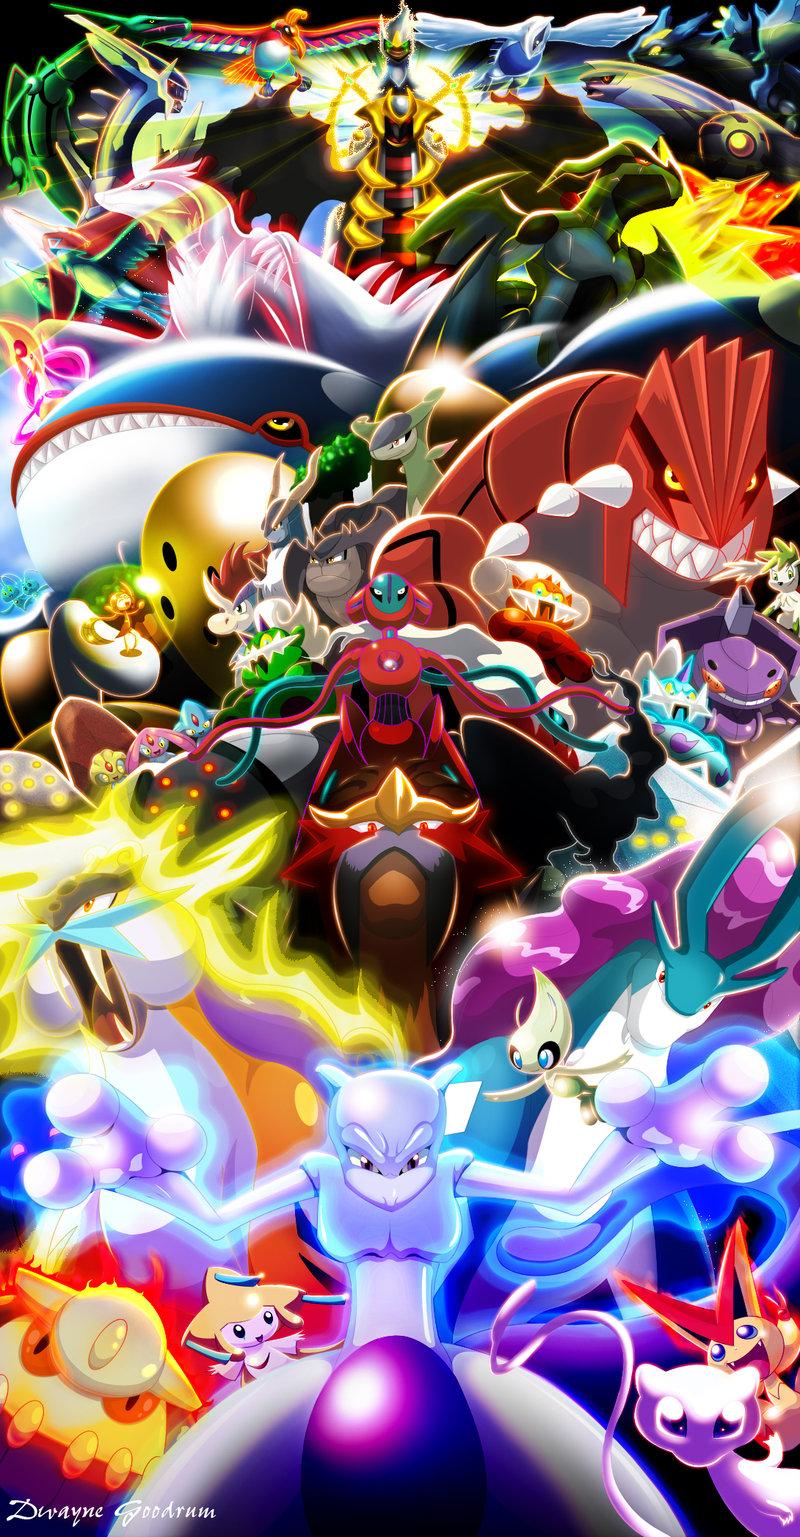 Every Legendary Pokemon (2012) by MightyGoodrum on DeviantArt